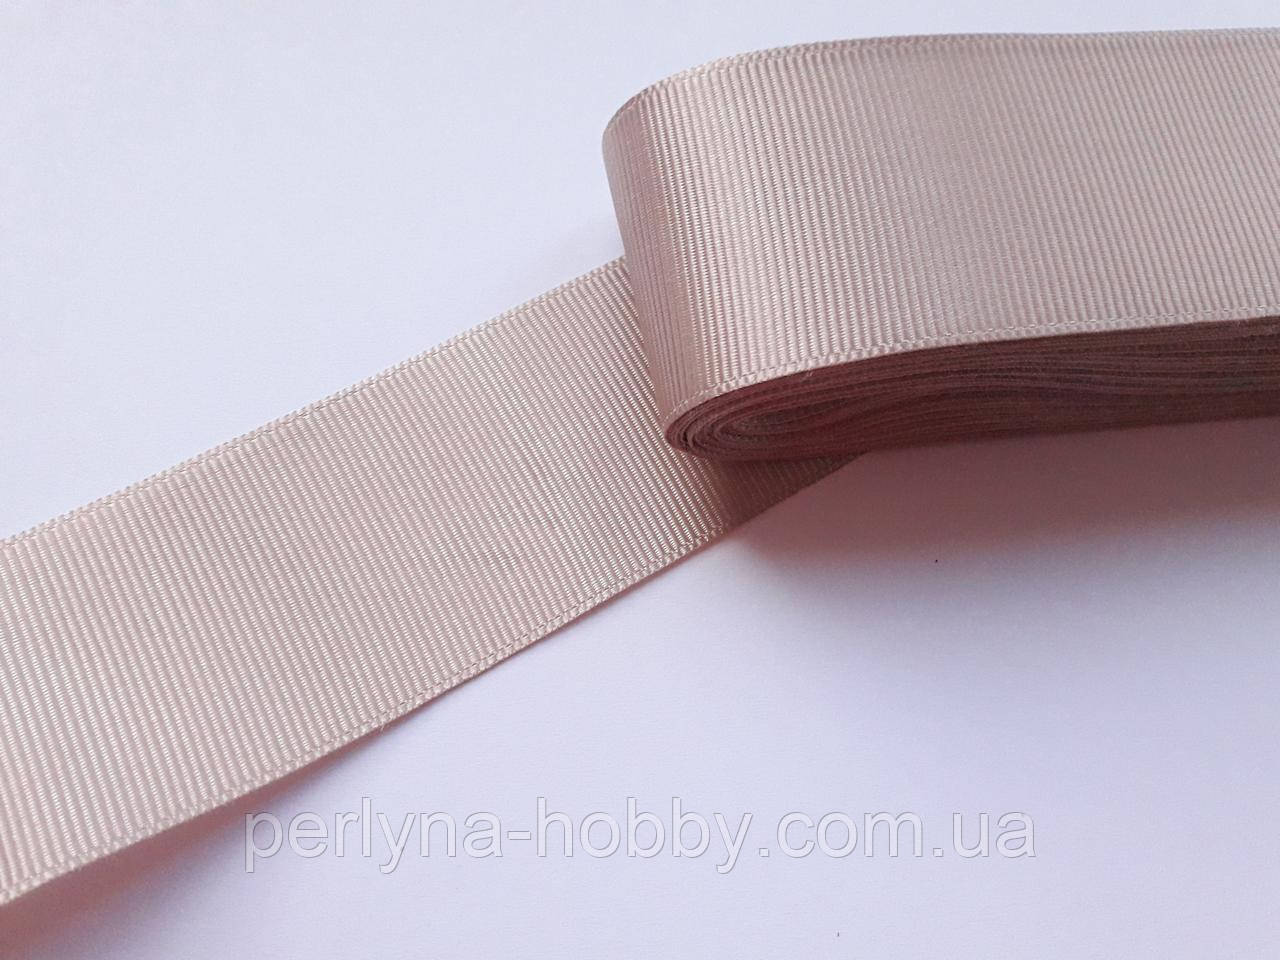 Тесьма лента репсовая широкая Стрічка репсова 4см 40 мм, бежево-брудно-рожева №26. Туреччина